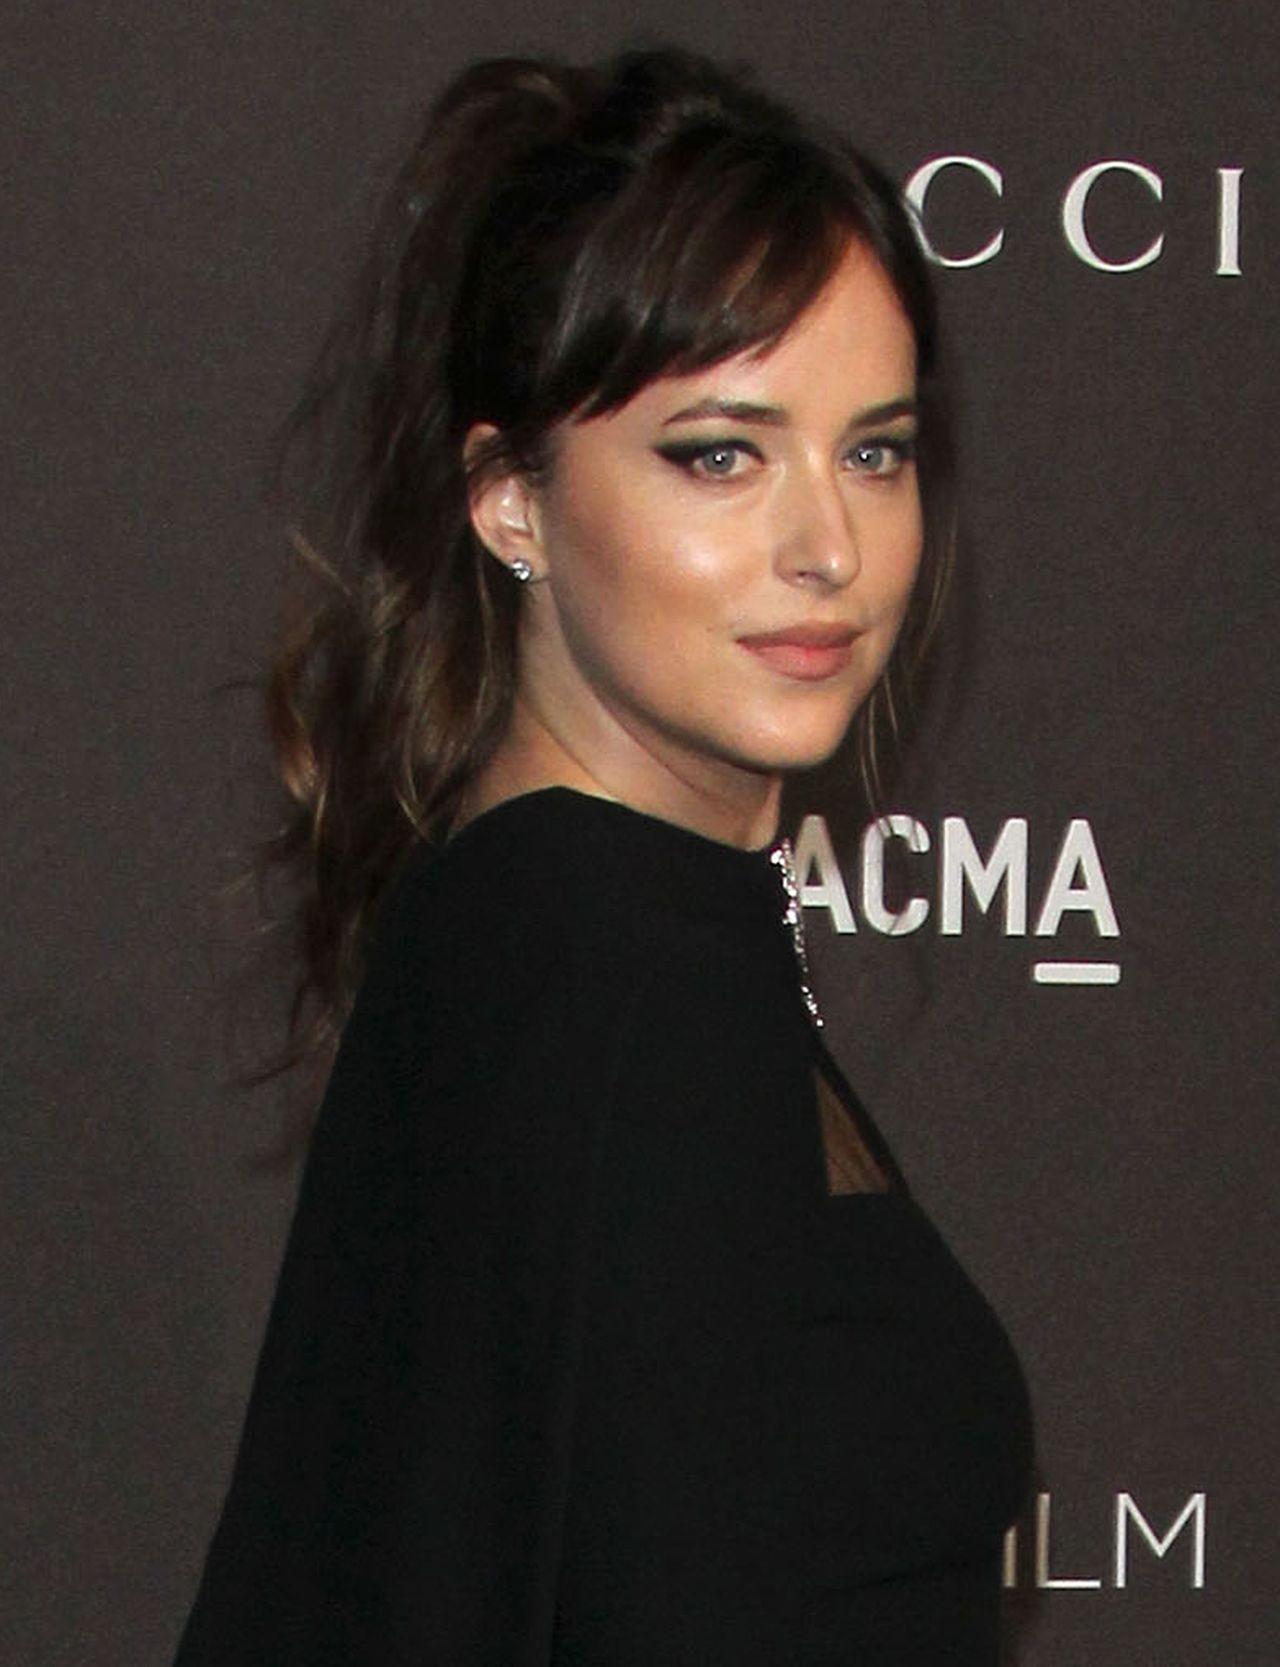 Dakota Johnson w kreacji od Gucci na gali LACMA – jak ocenicie jej look?